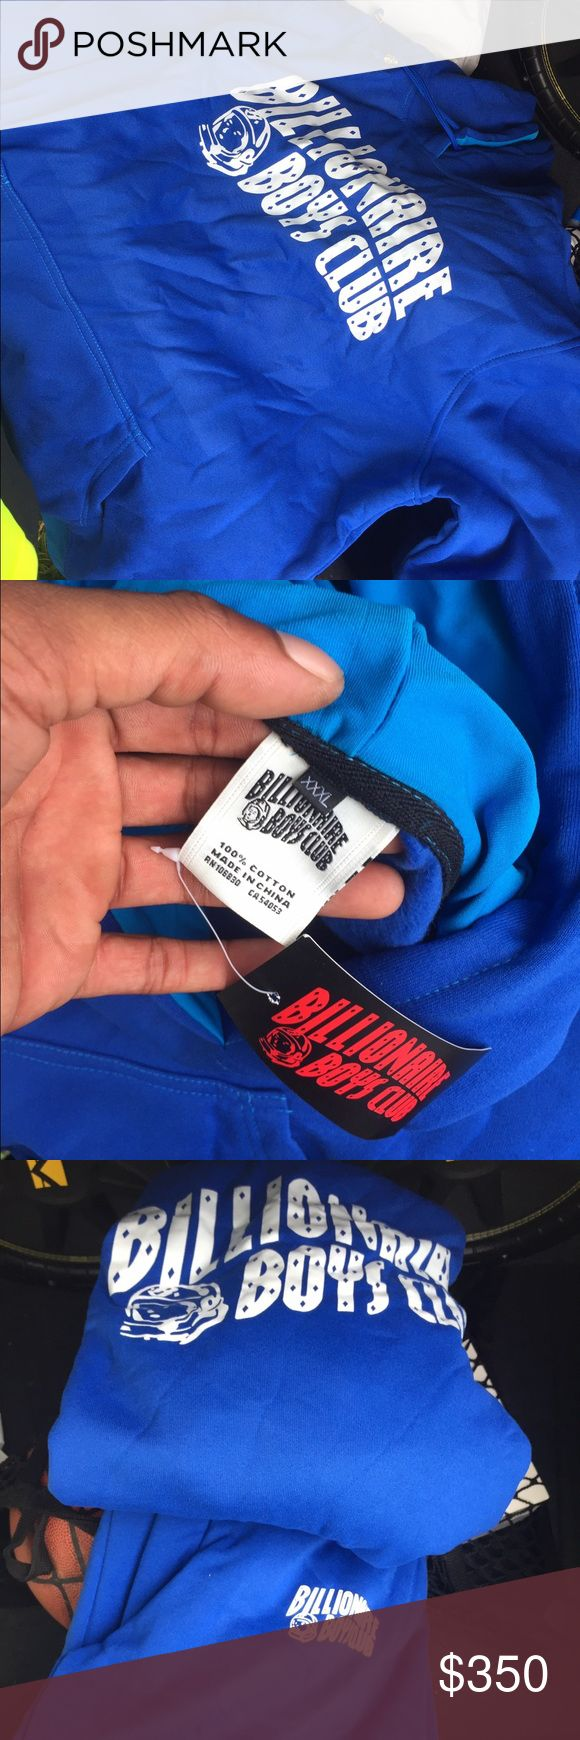 Billionaires Boys Club sweatsuit! New size:XXL New with tags, never worn, ordered too darn big. Will work with you on price Billionaire Boys Club Shirts Sweatshirts & Hoodies